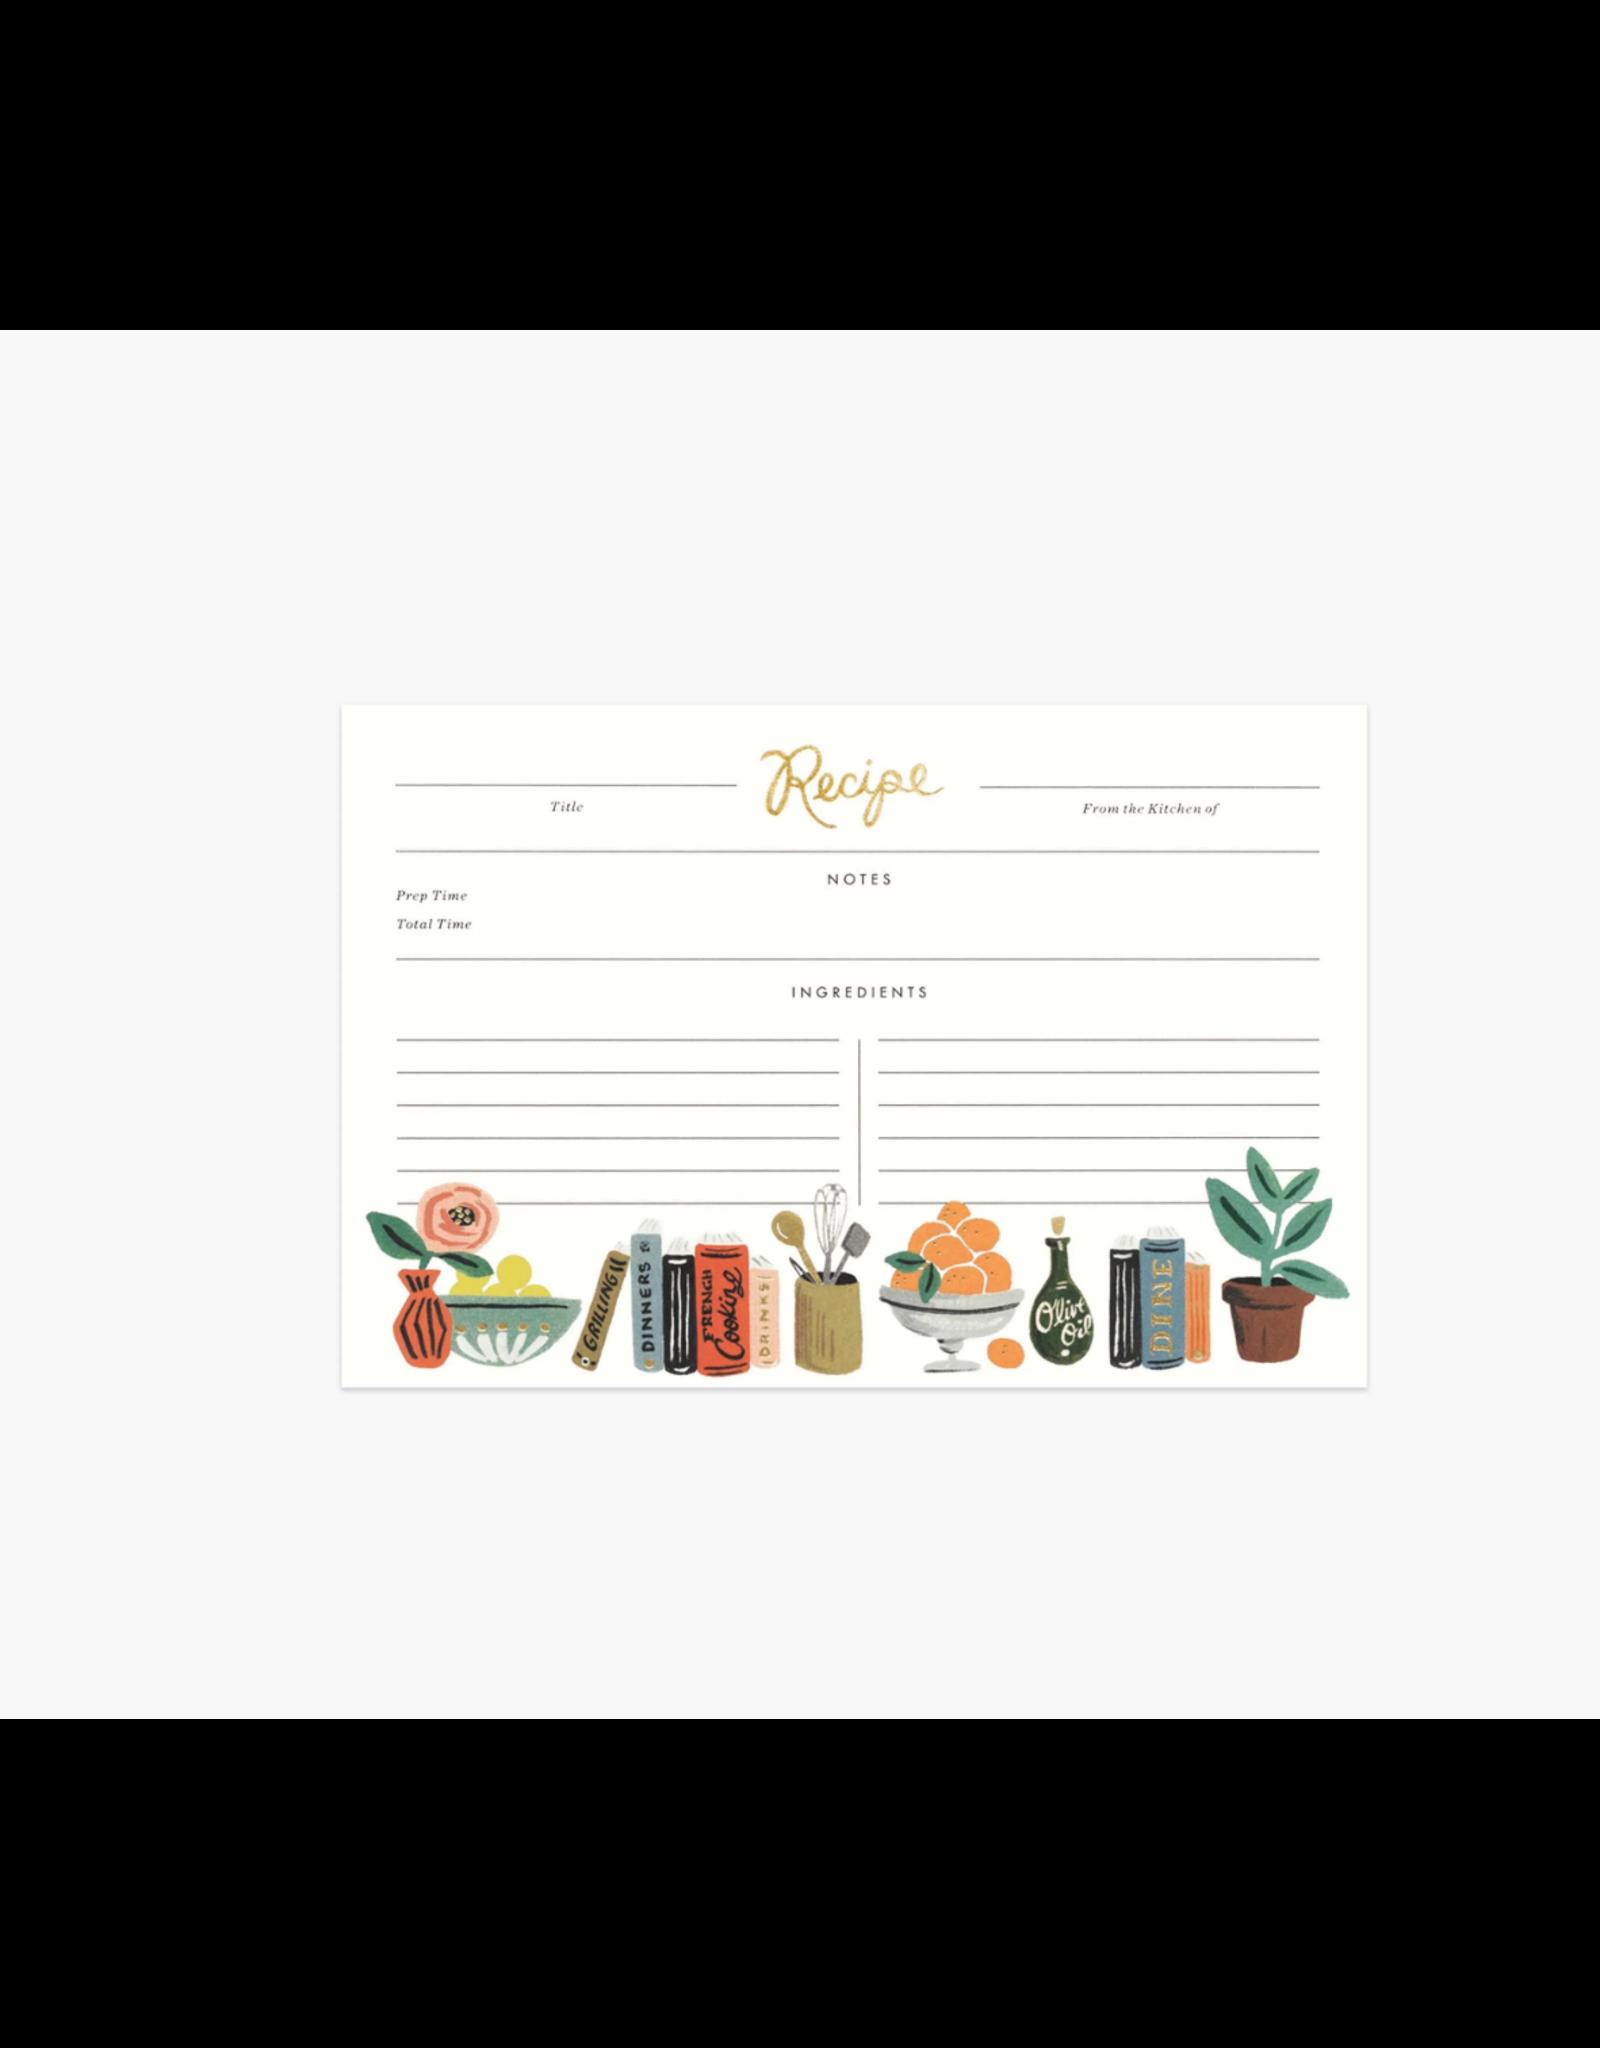 Kitchen Shelf Recipe Cards, Pack of 12